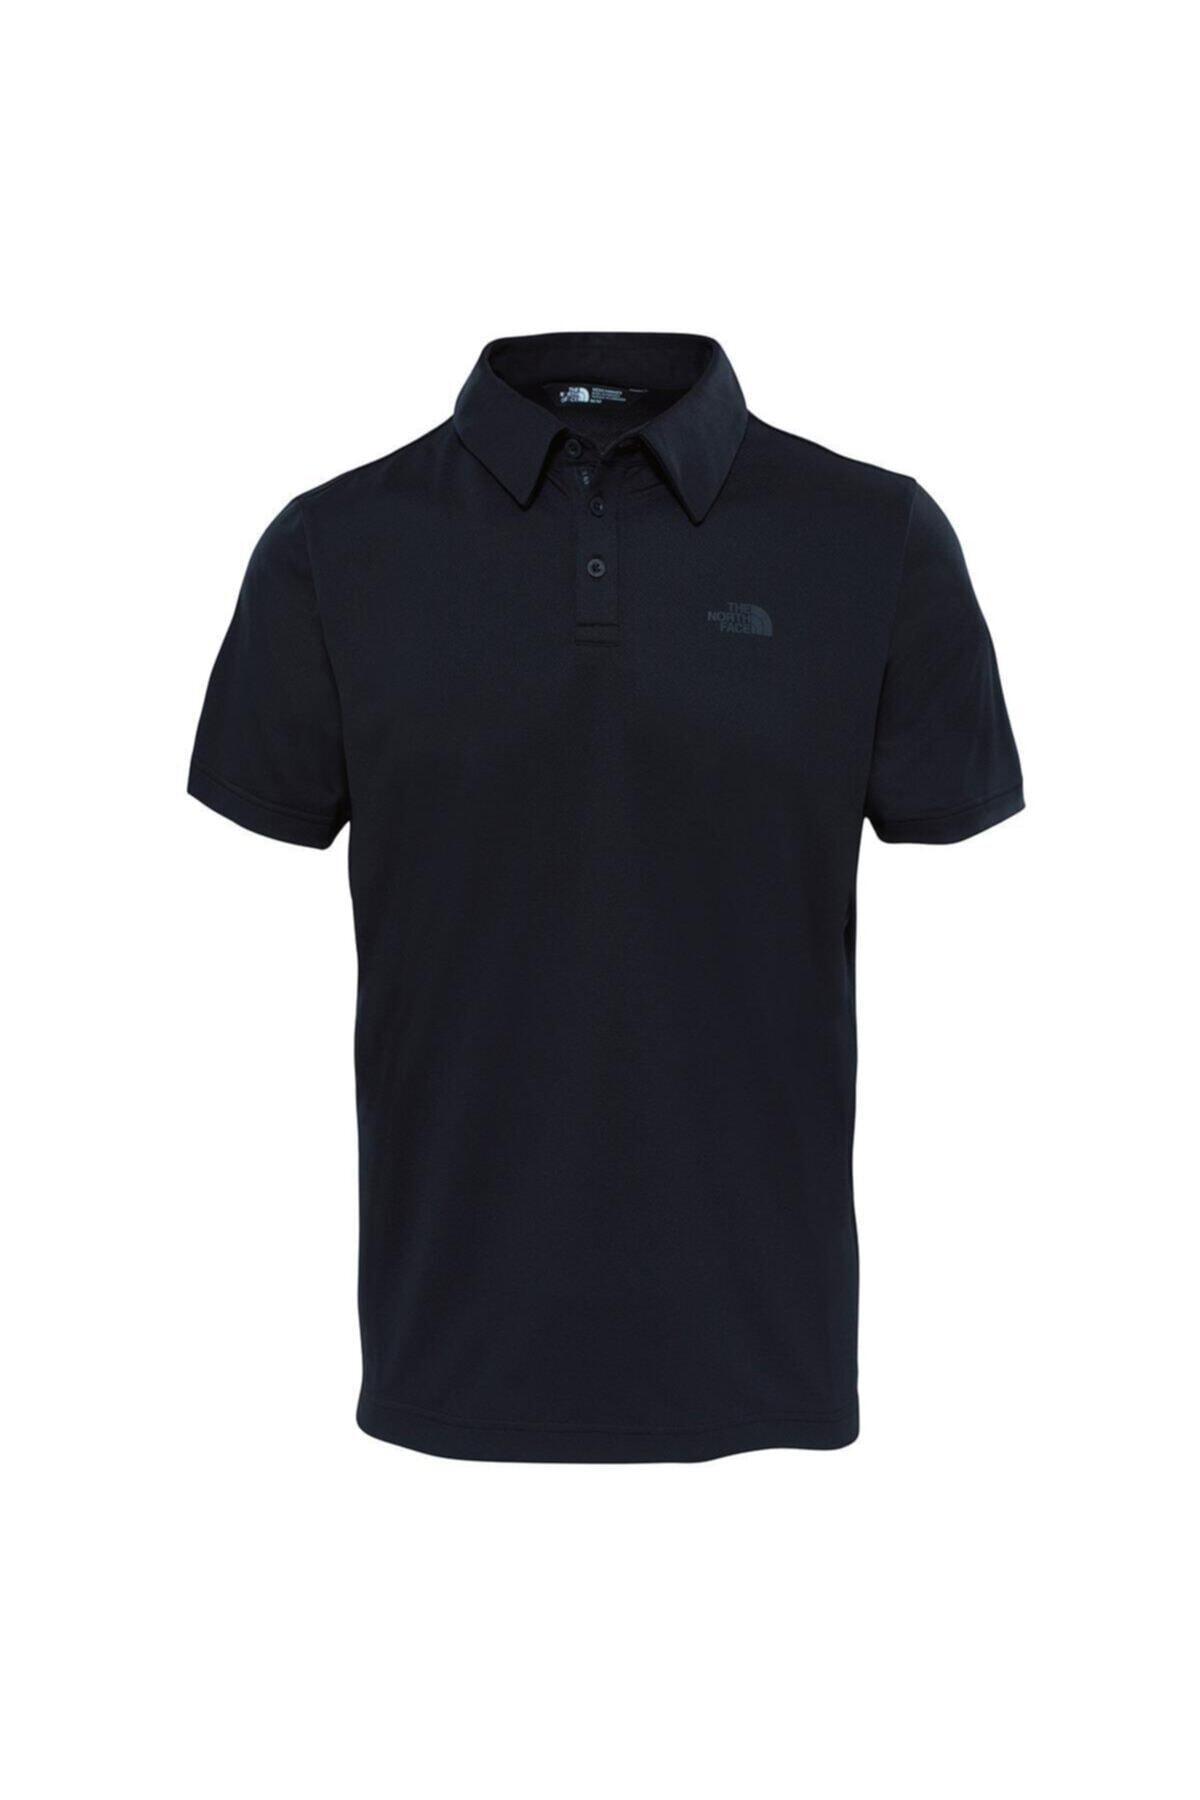 THE NORTH FACE Tanken Polo Erkek T-shirt Siyah 1